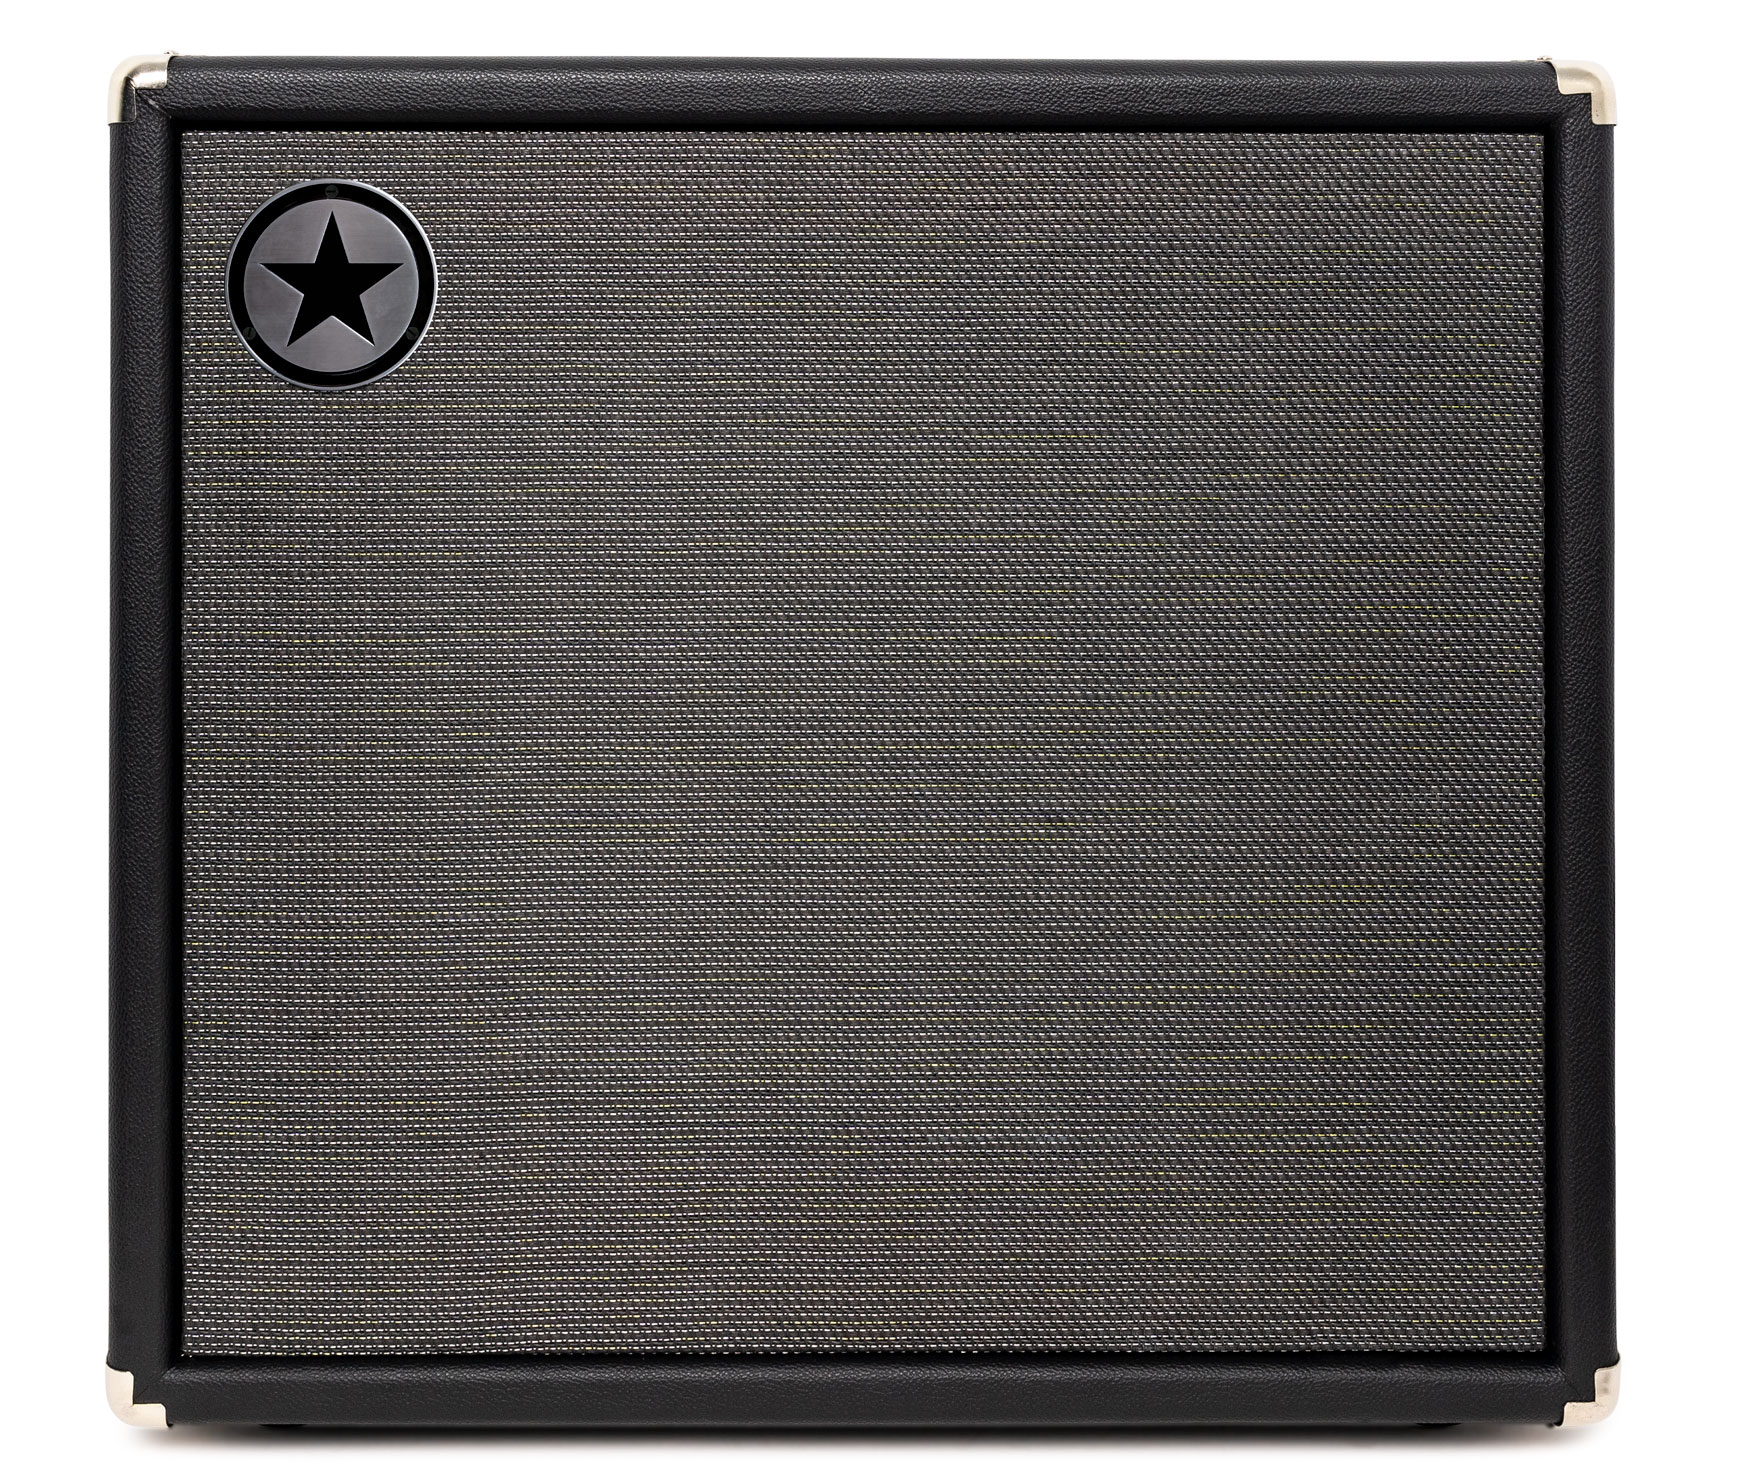 BLACKSTAR-Unity-Bass-4-x-10-Cabinet-sku-65298644440